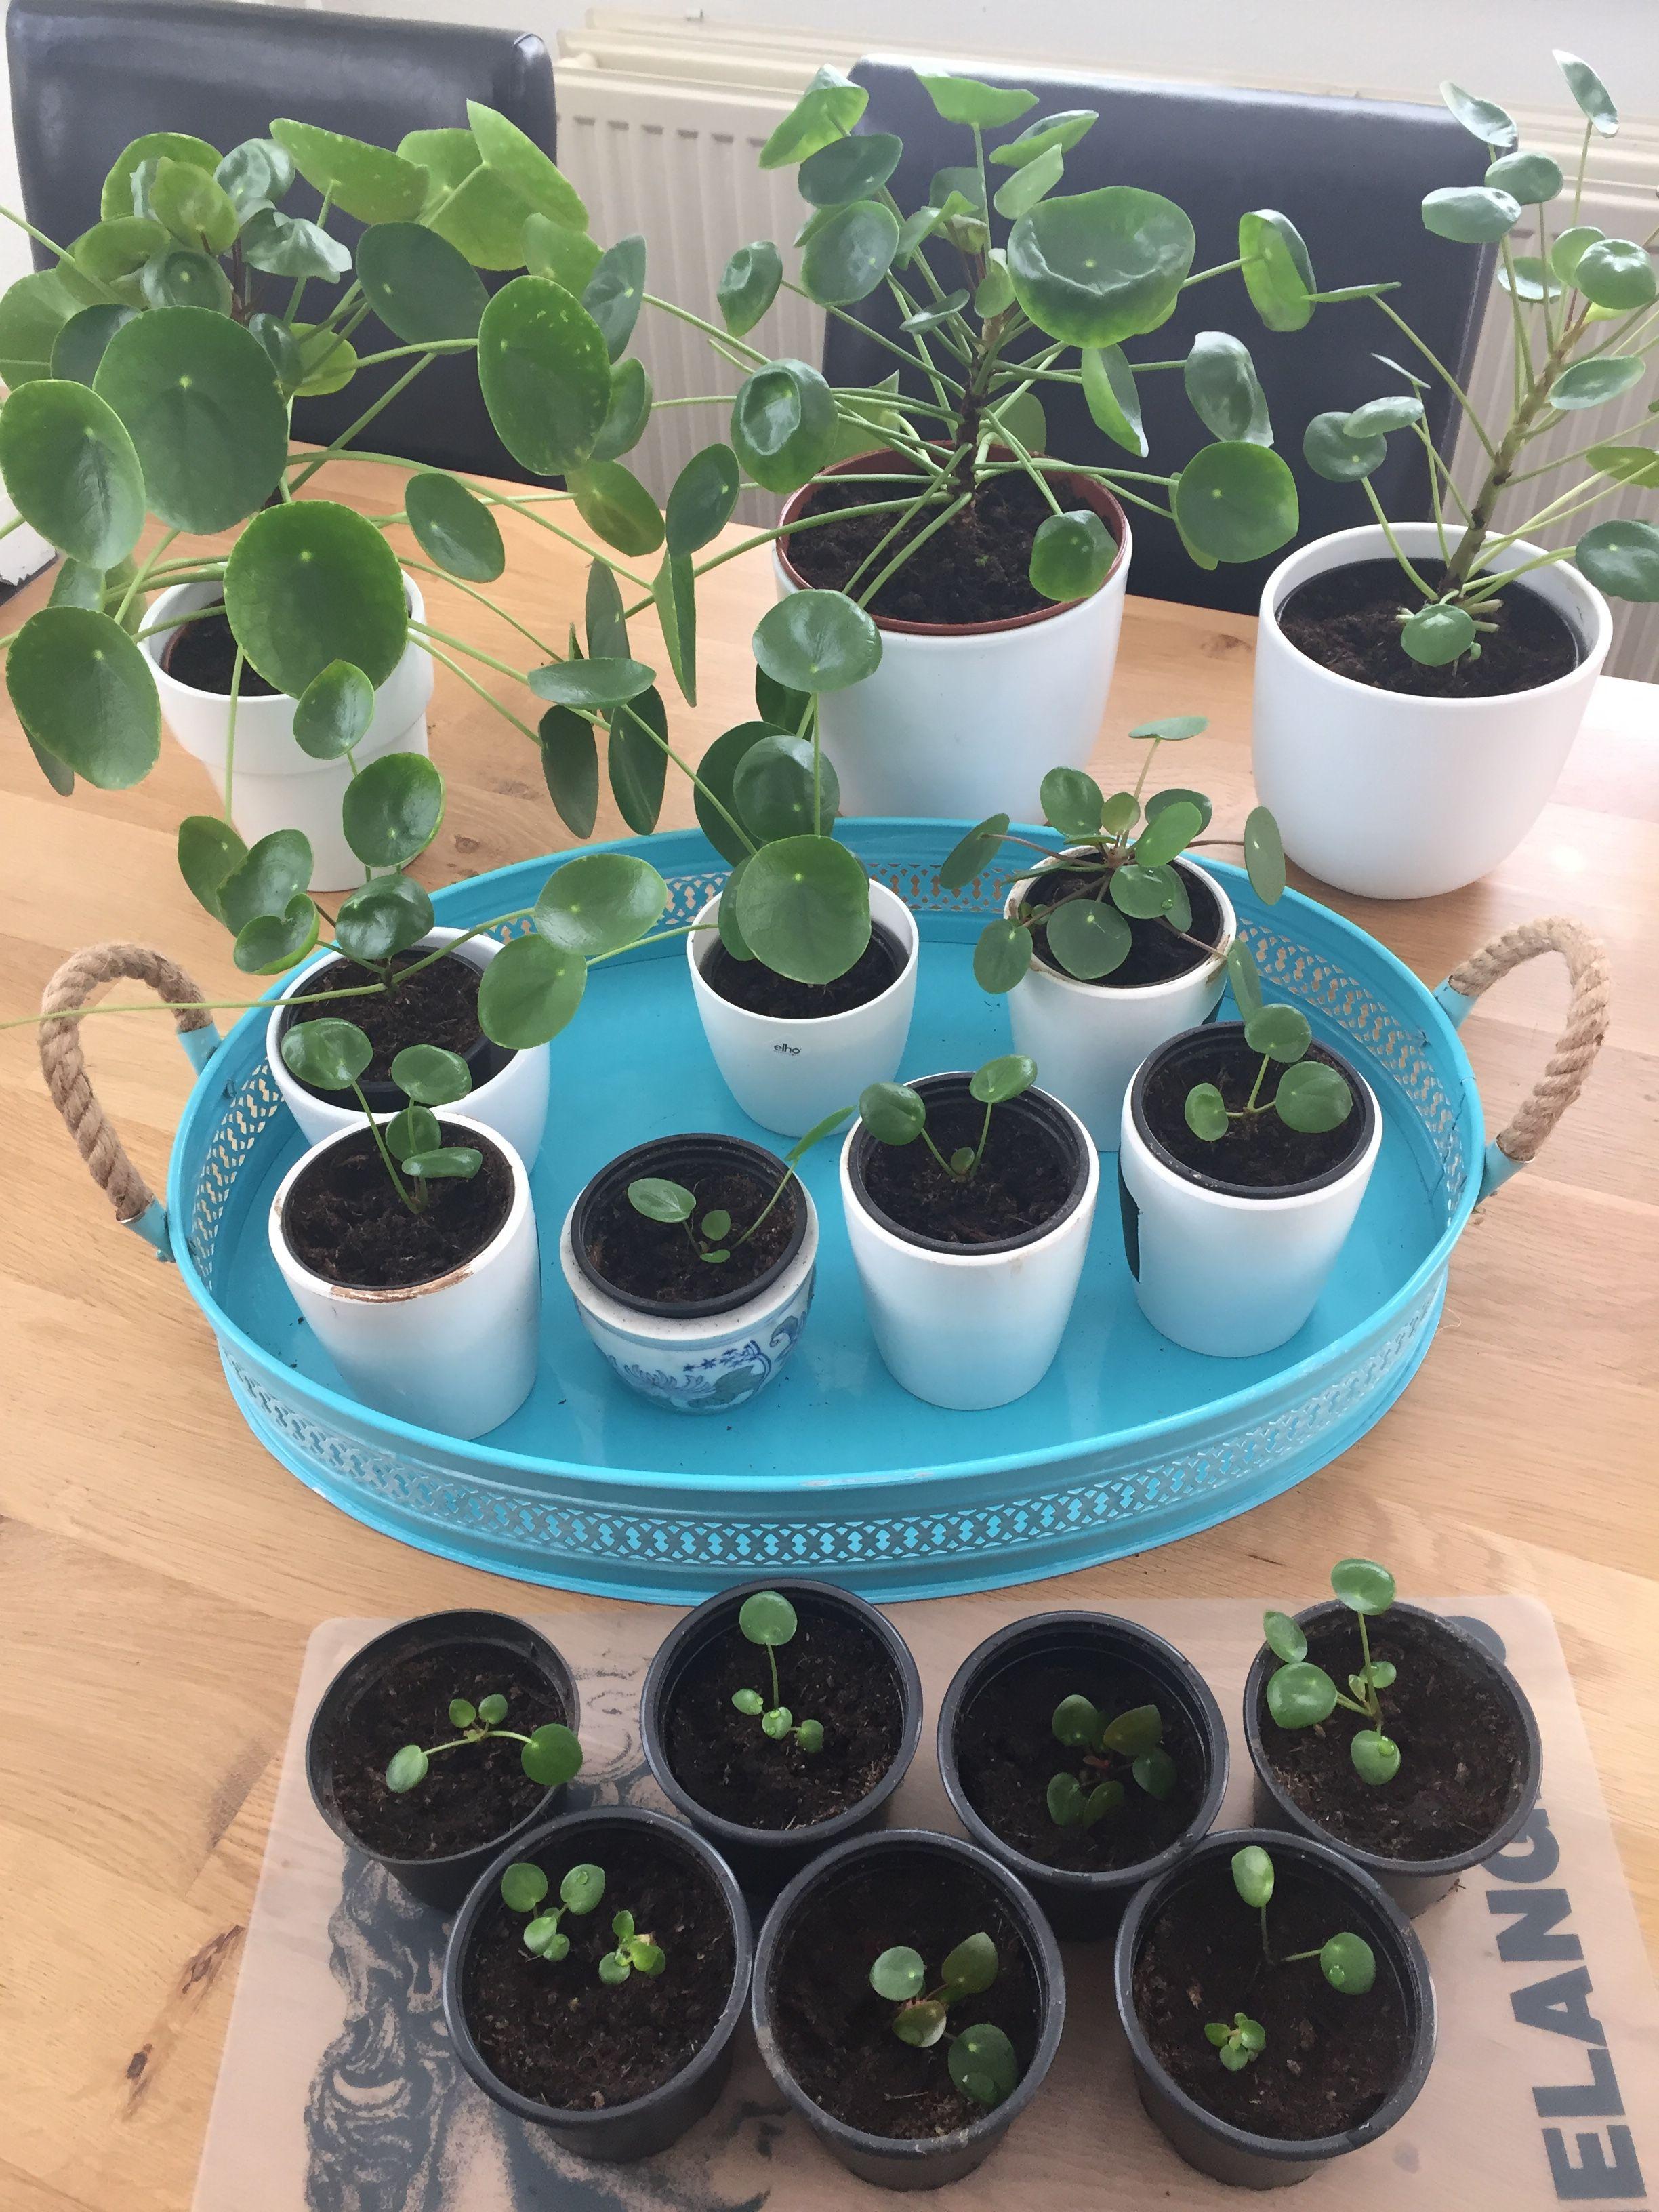 Pin On Indoors: Inside Plants, Indoor Plants, Plants